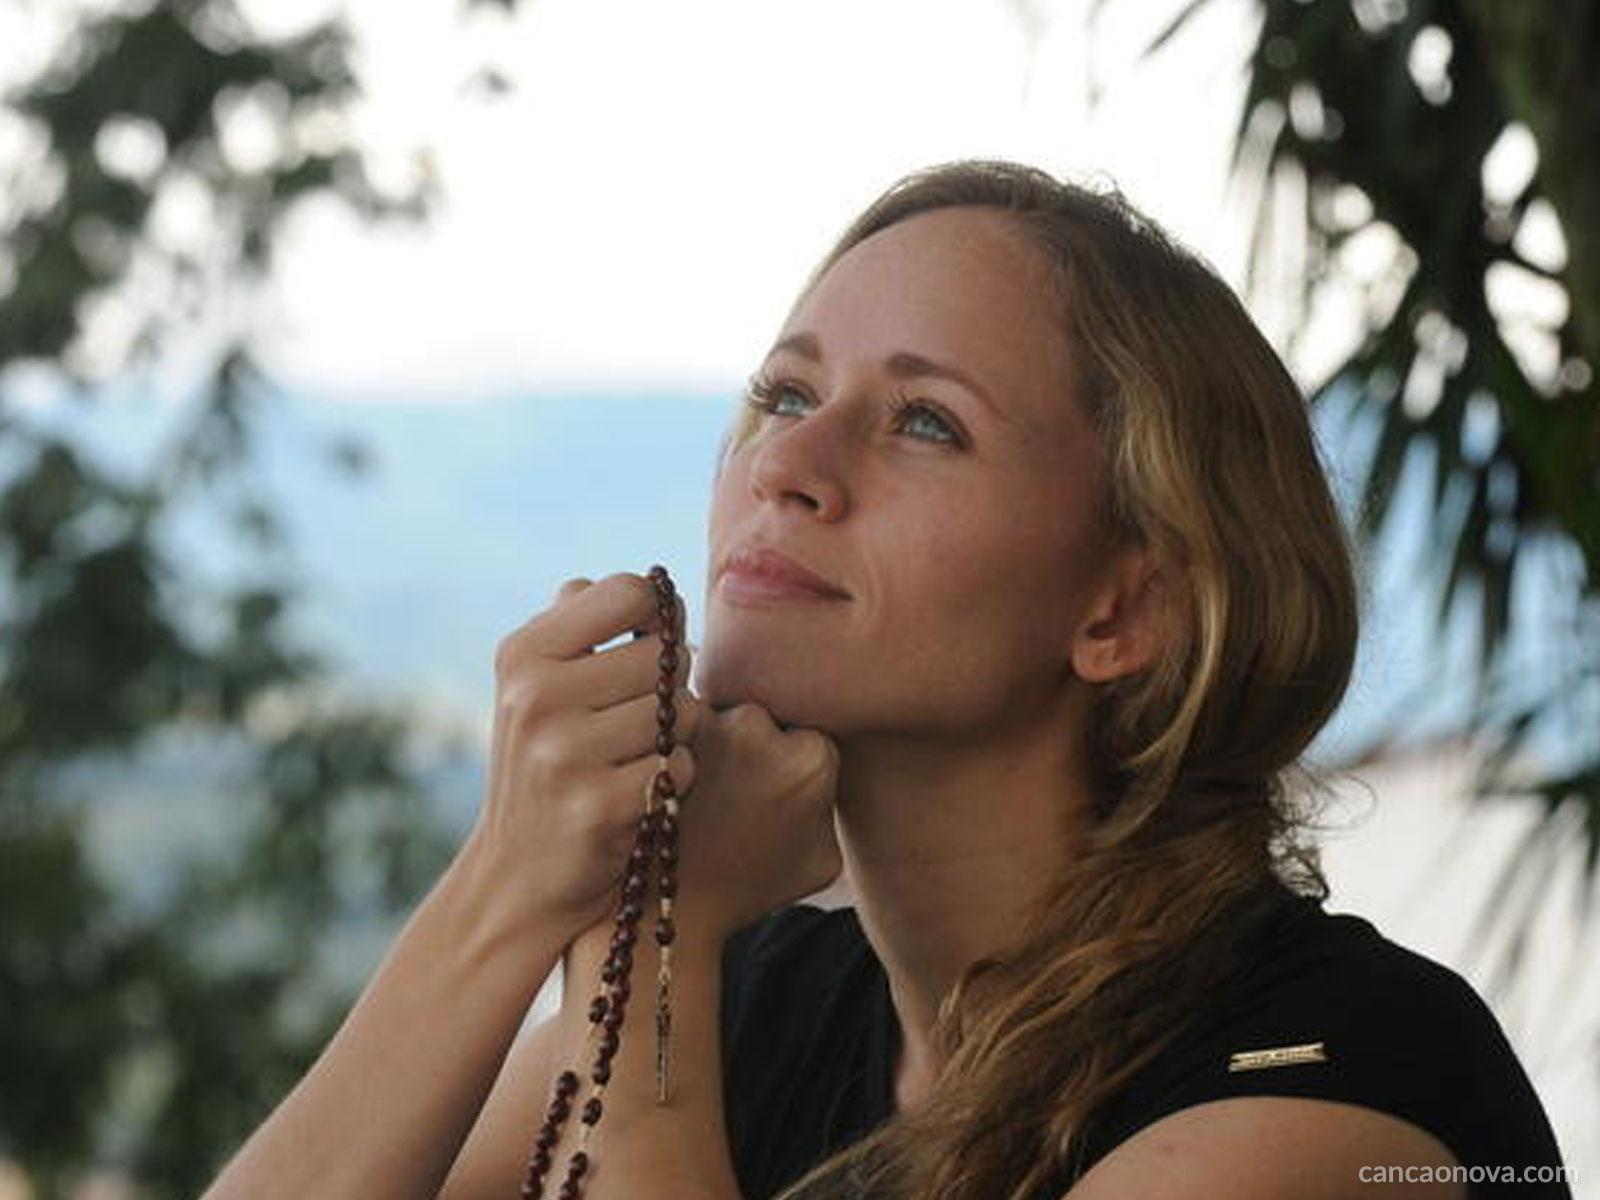 Como podemos buscar viver um vida de santidade